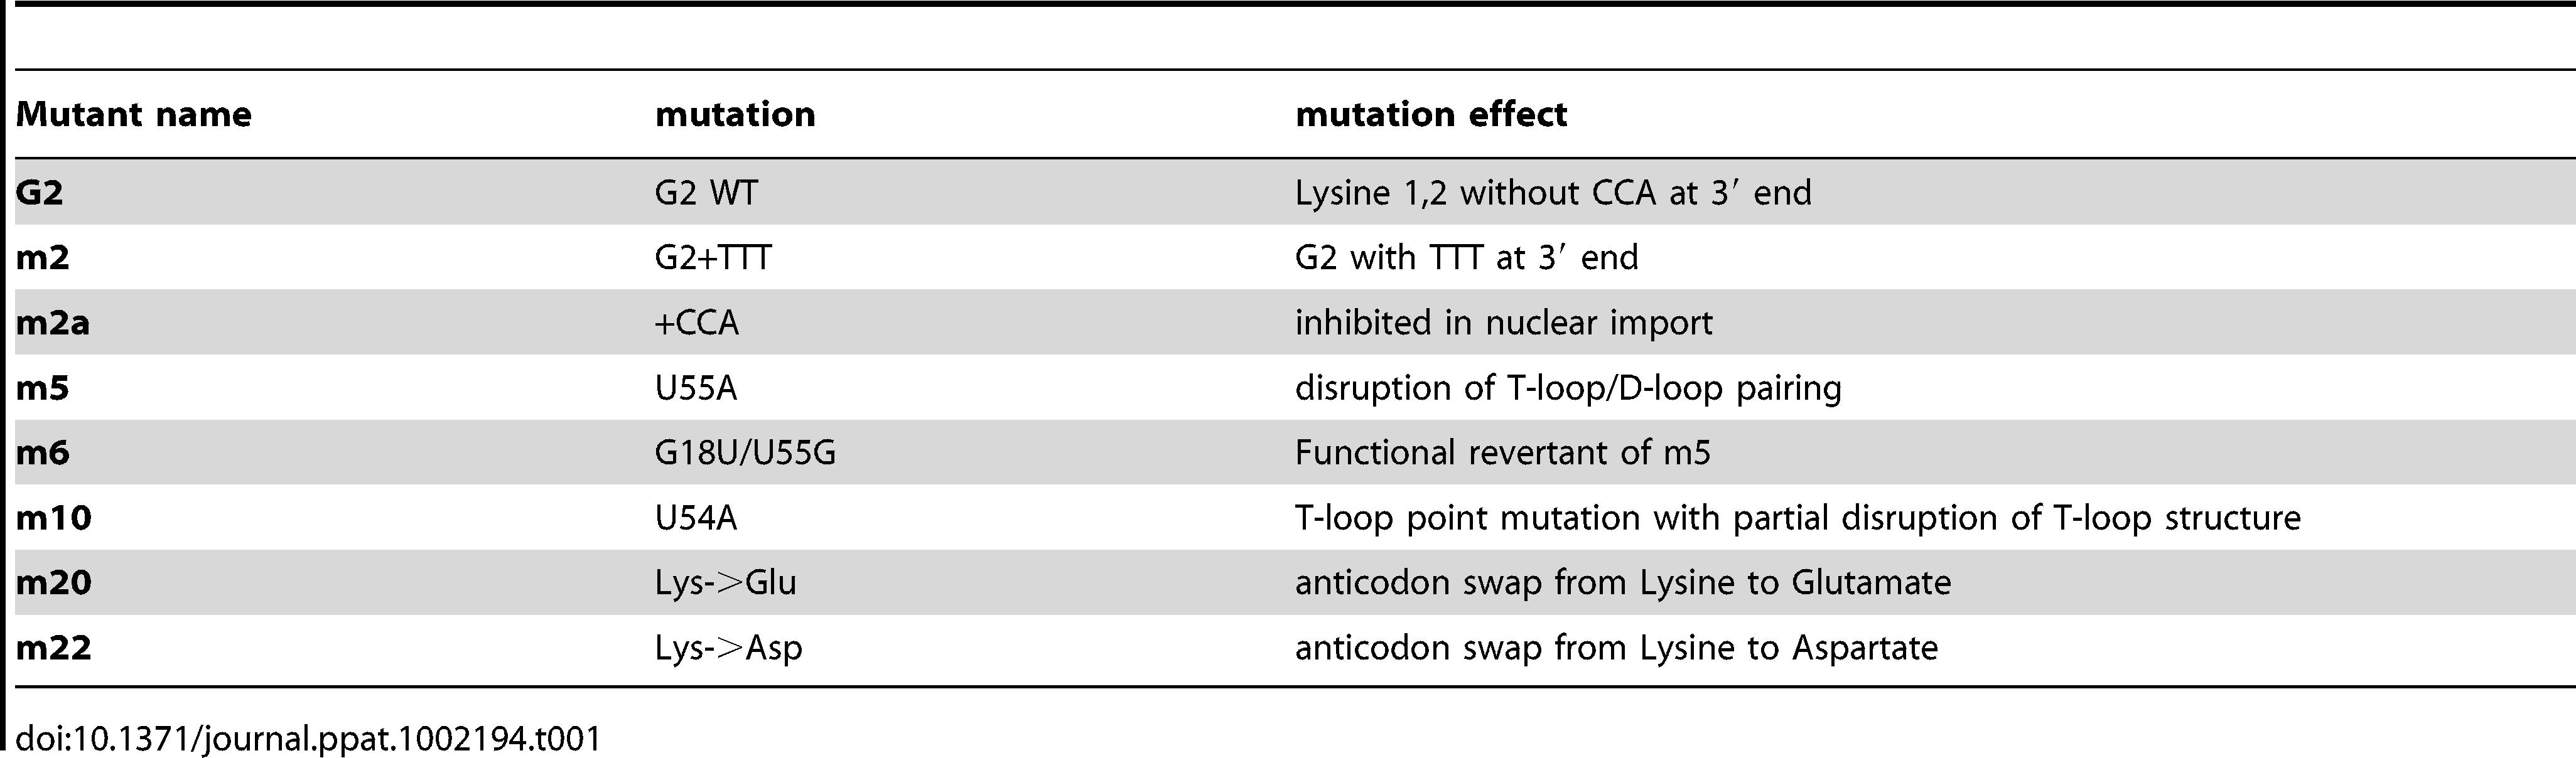 tRNA mutants generated and their characteristics.